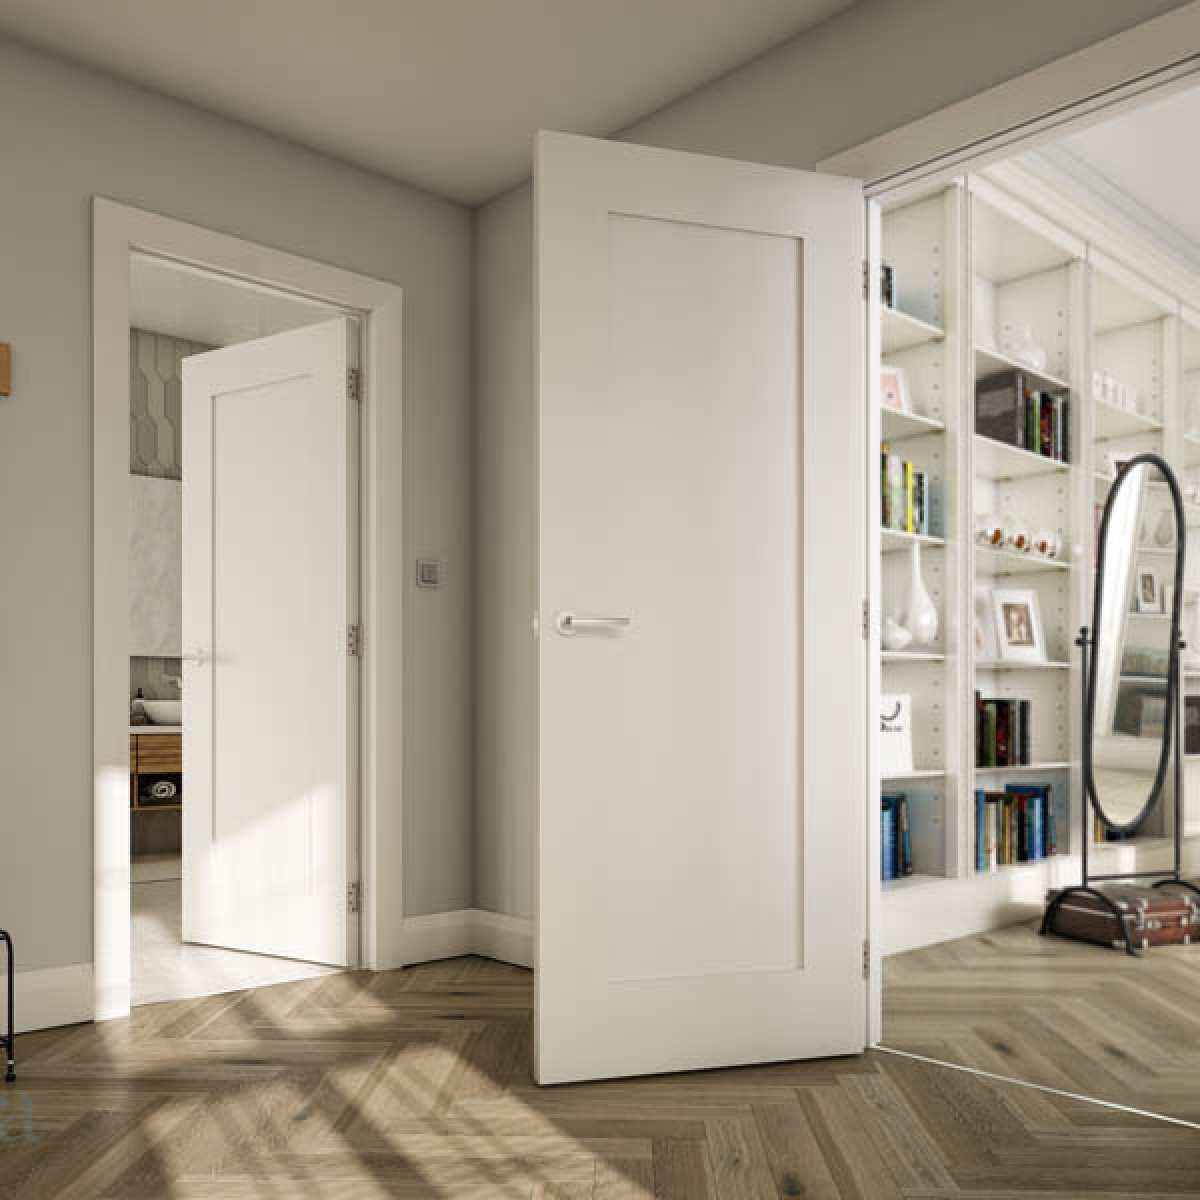 denver white primed lifestyle websters Image by Websters Timber